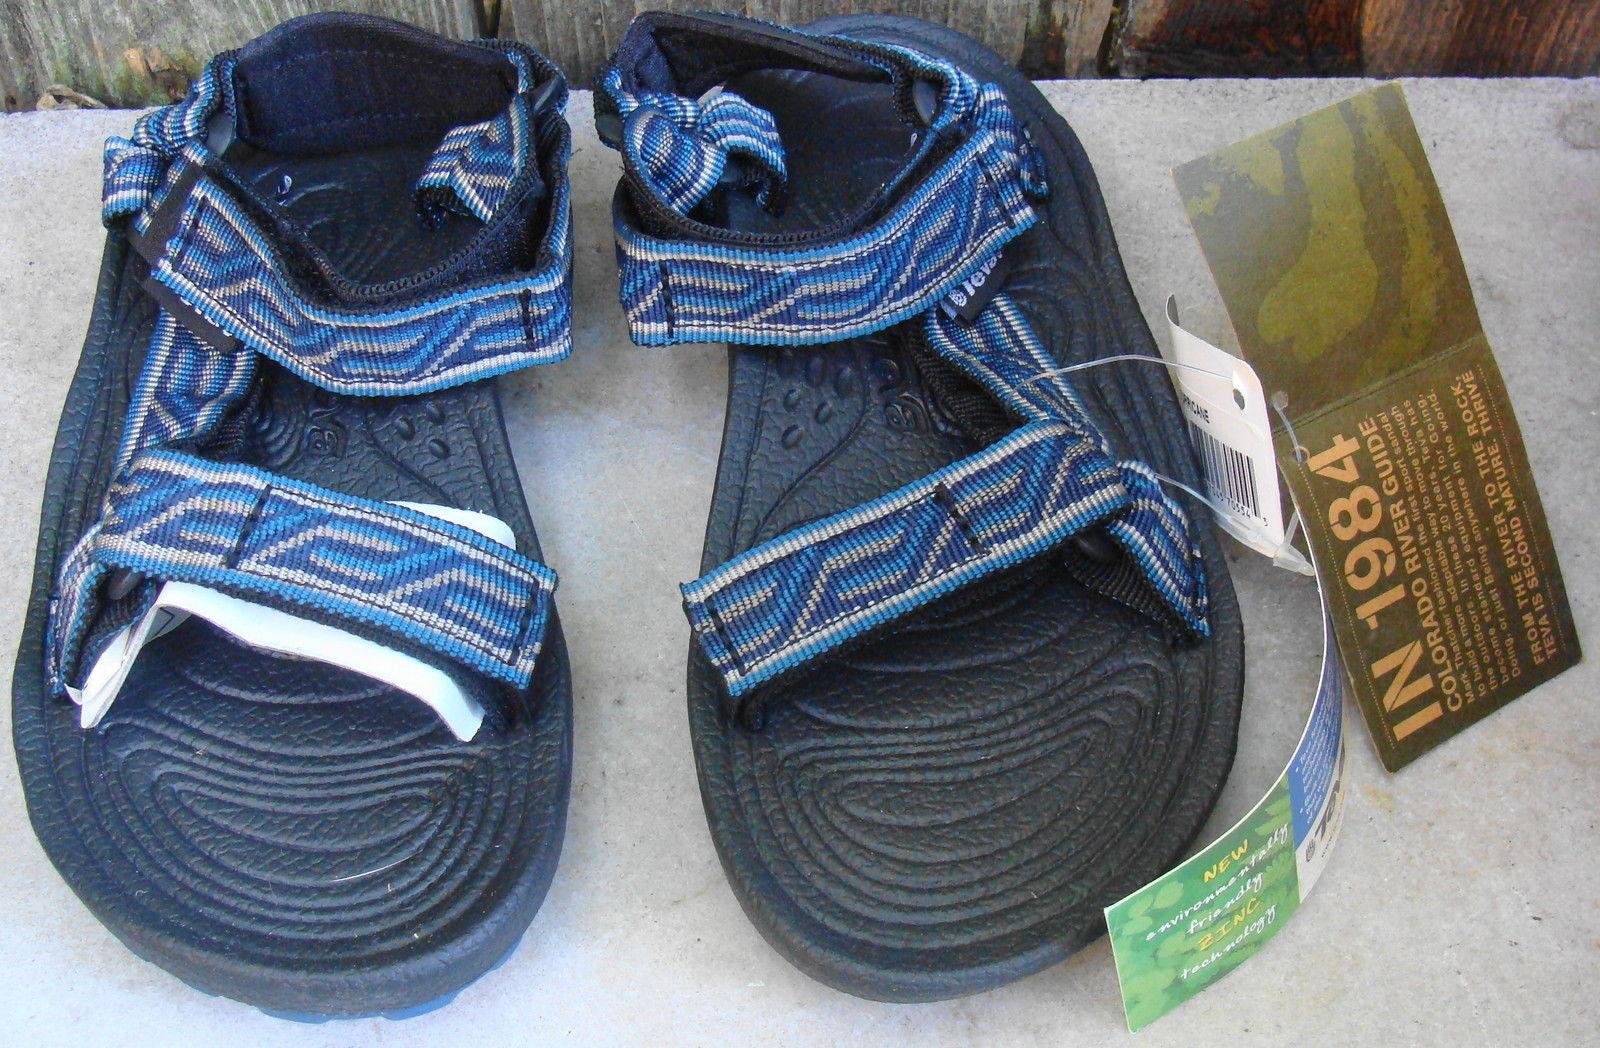 925947b69 S l1600. S l1600. Previous. Teva Kid s Hurricane Gradient Diagonal Greek  Blue Sandals Size 2